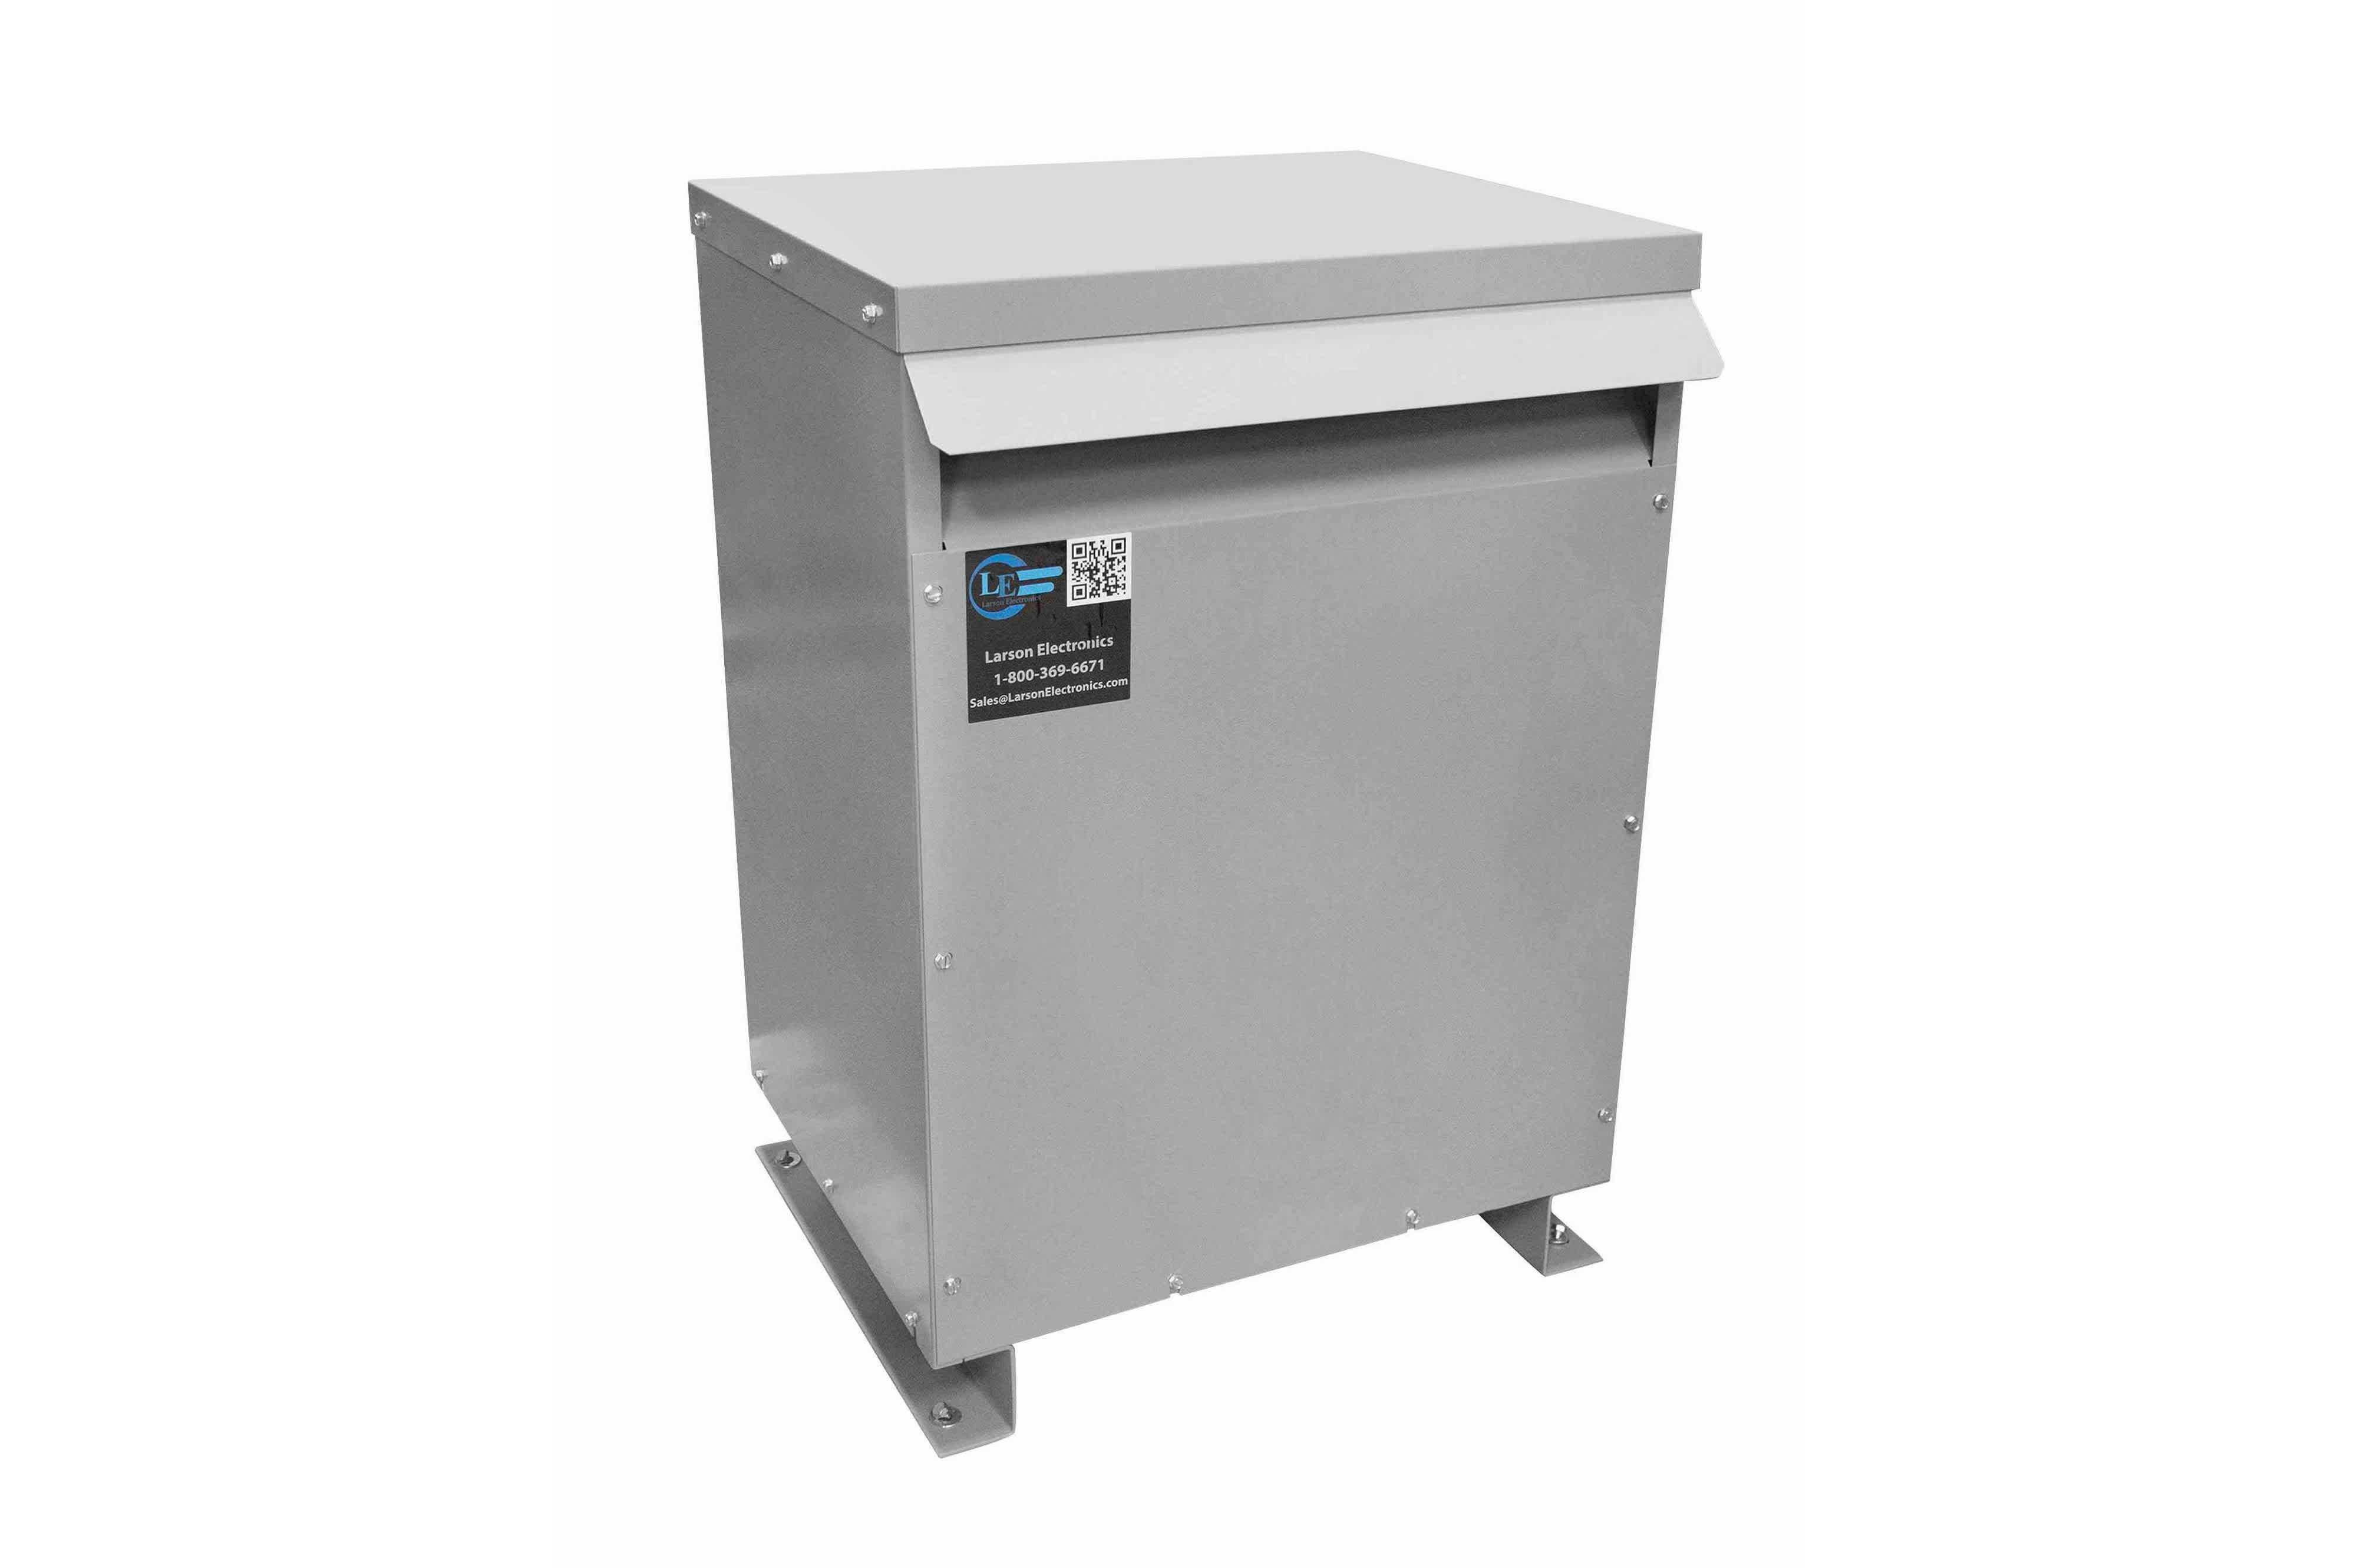 200 kVA 3PH Isolation Transformer, 480V Wye Primary, 575Y/332 Wye-N Secondary, N3R, Ventilated, 60 Hz